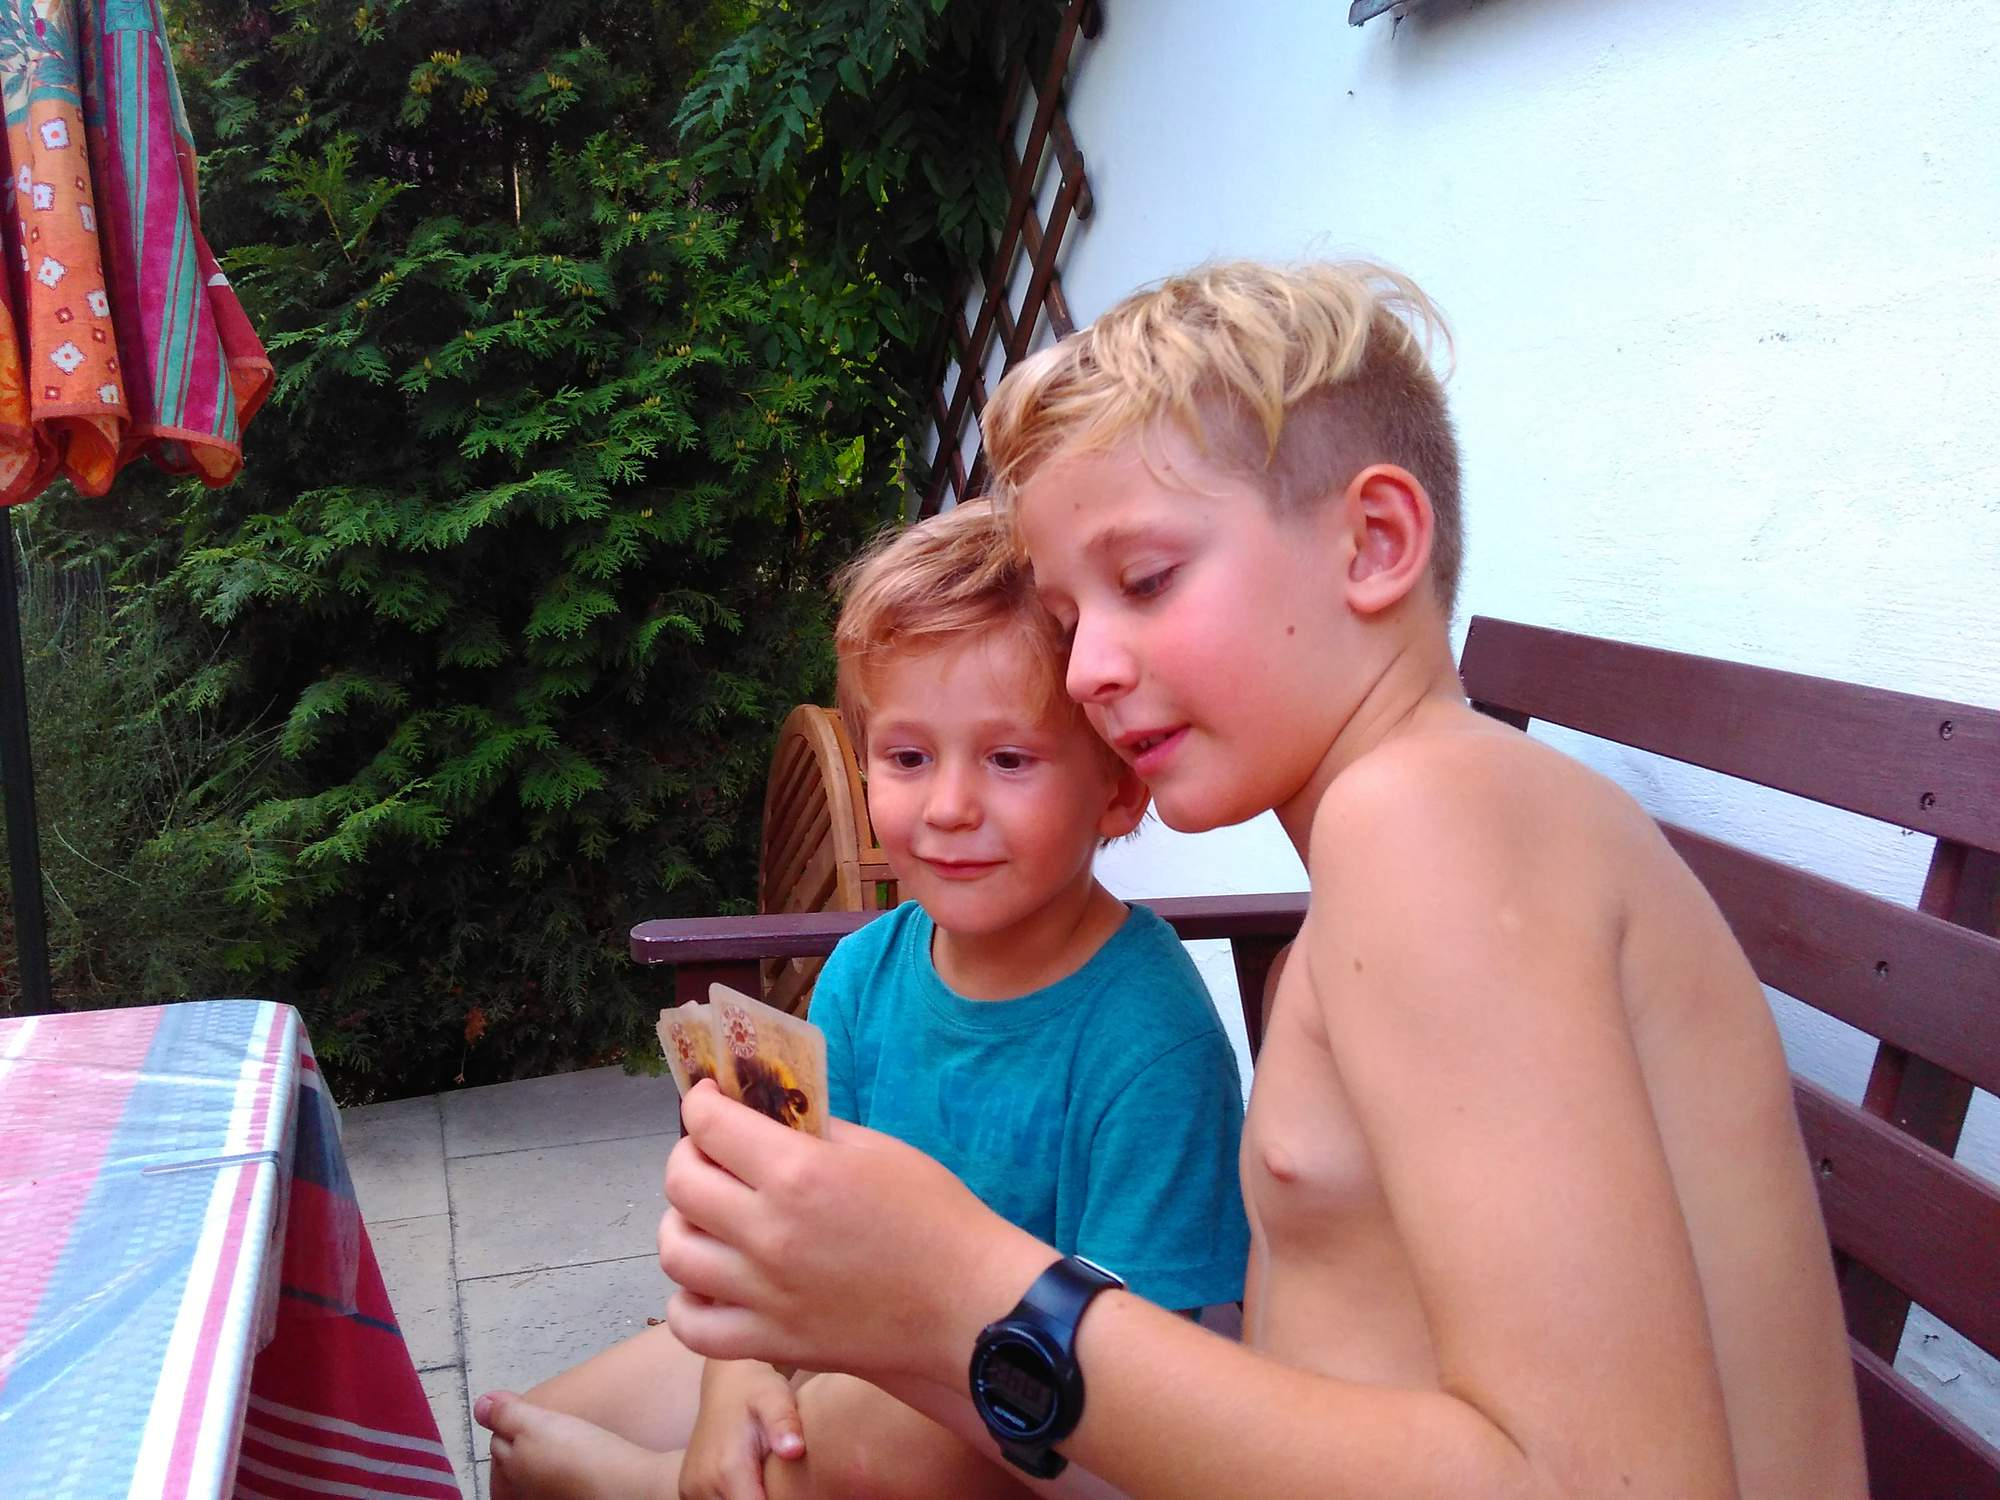 rajce.idnes.cs.net boy sharkas - iDNES.cz